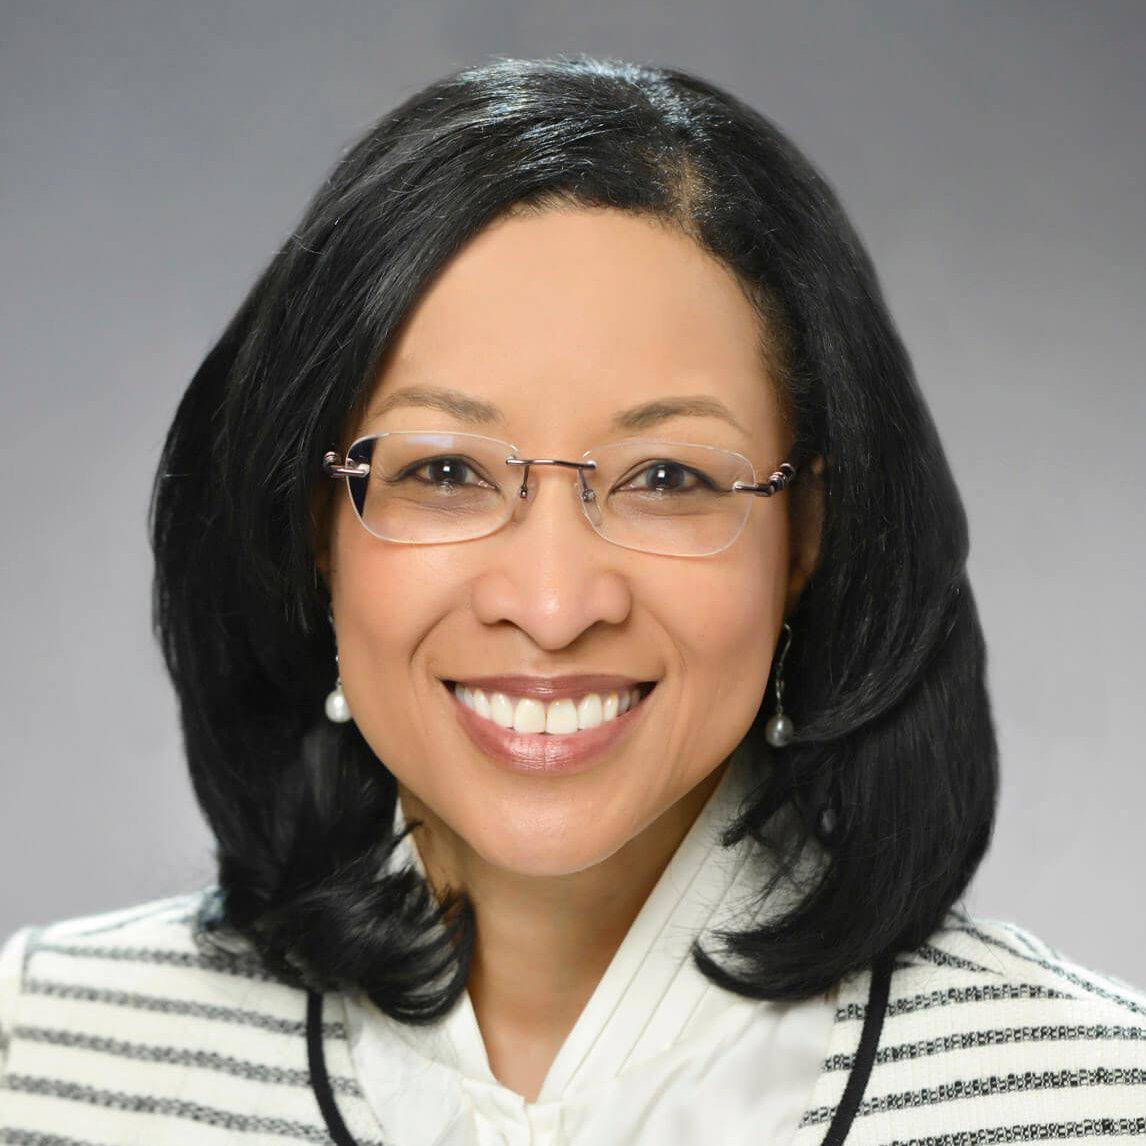 Teresa Wynn Roseborough